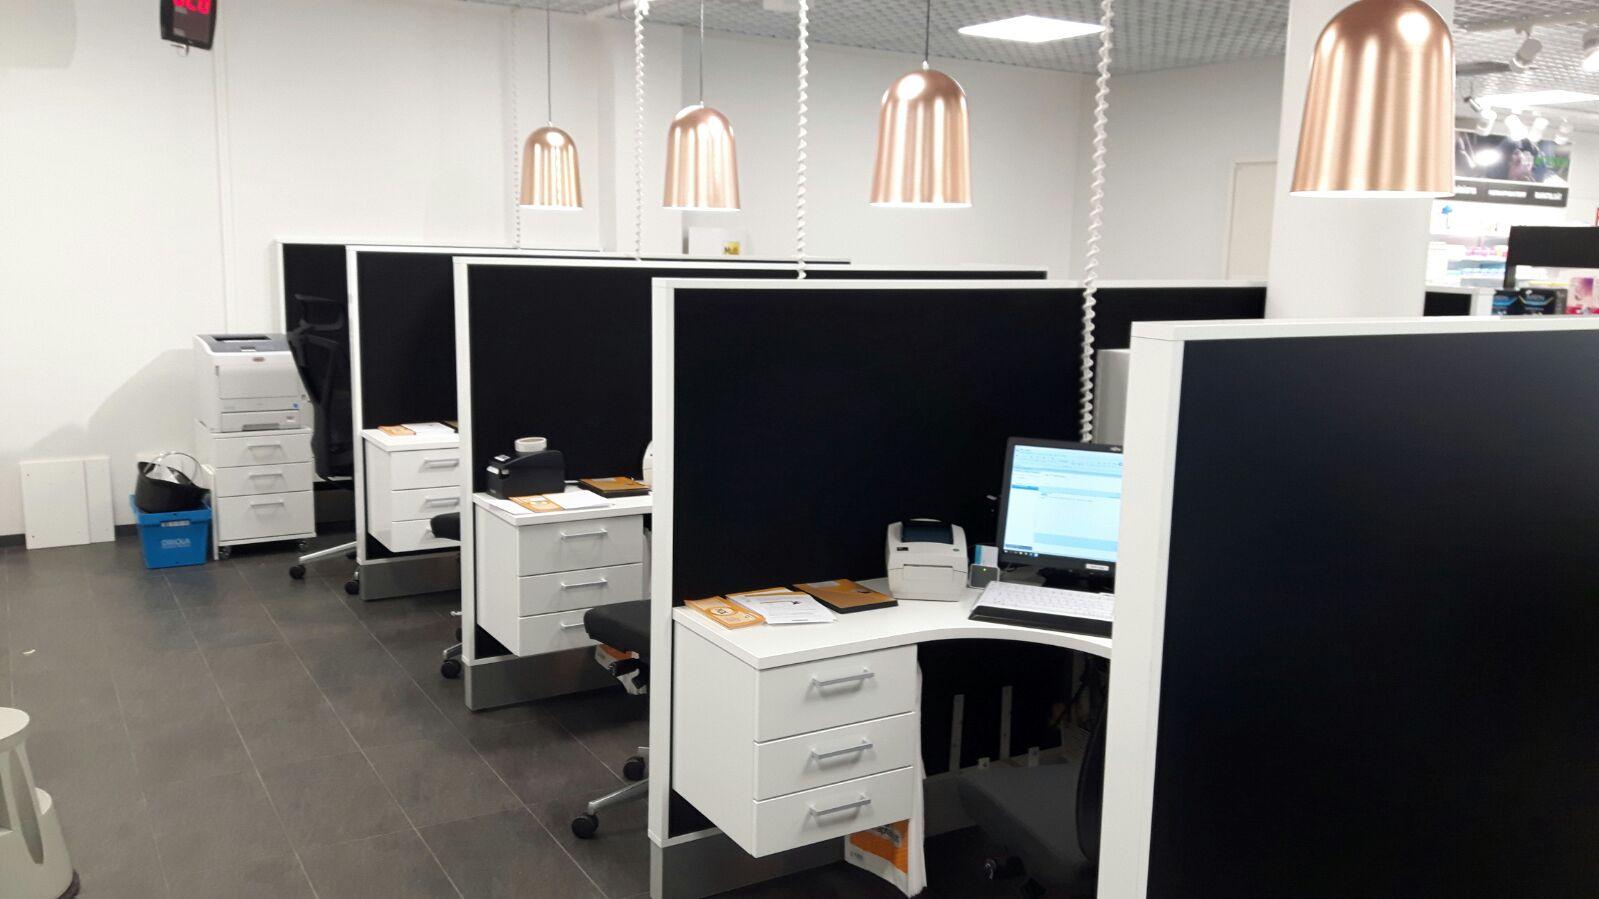 vmp-interior_uudisti_lappeenrannan_city_apteekin_44.jpg